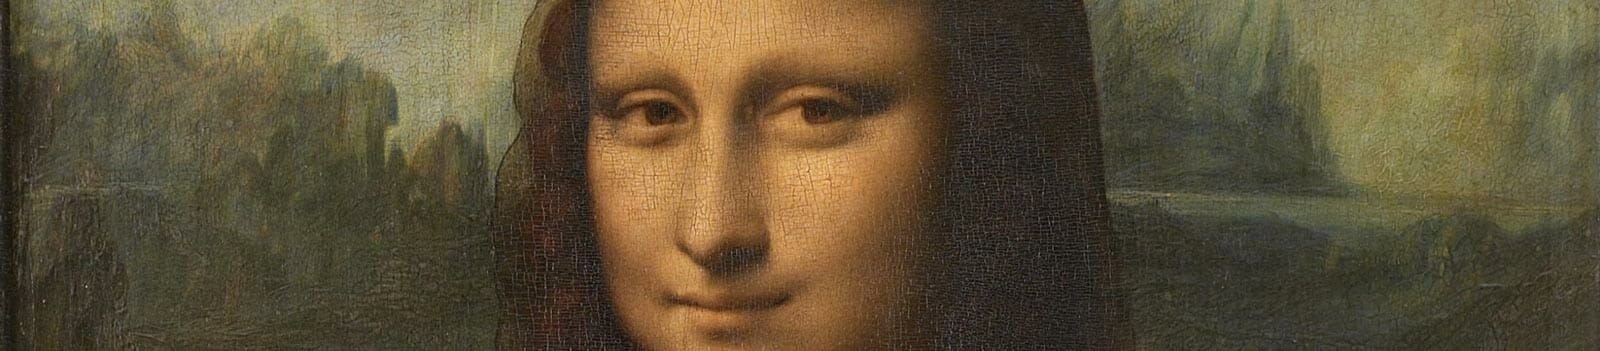 Painting the Mona Lisa like Leonardo da Vinci